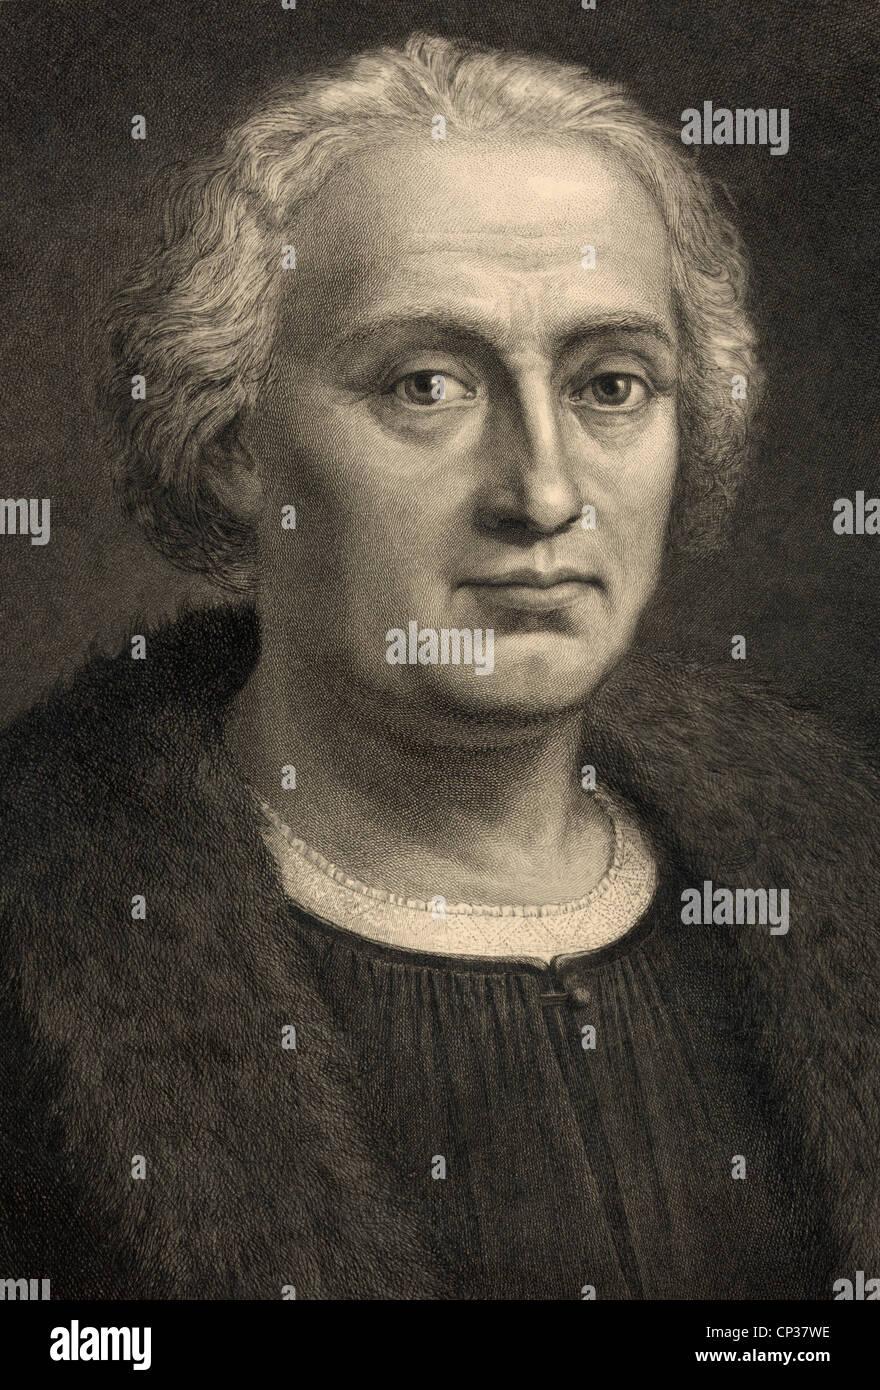 Christopher Columbus 1451-1506. Italienisch Spanisch geboren finanziert Explorer Entdecker Amerikas. Stockfoto